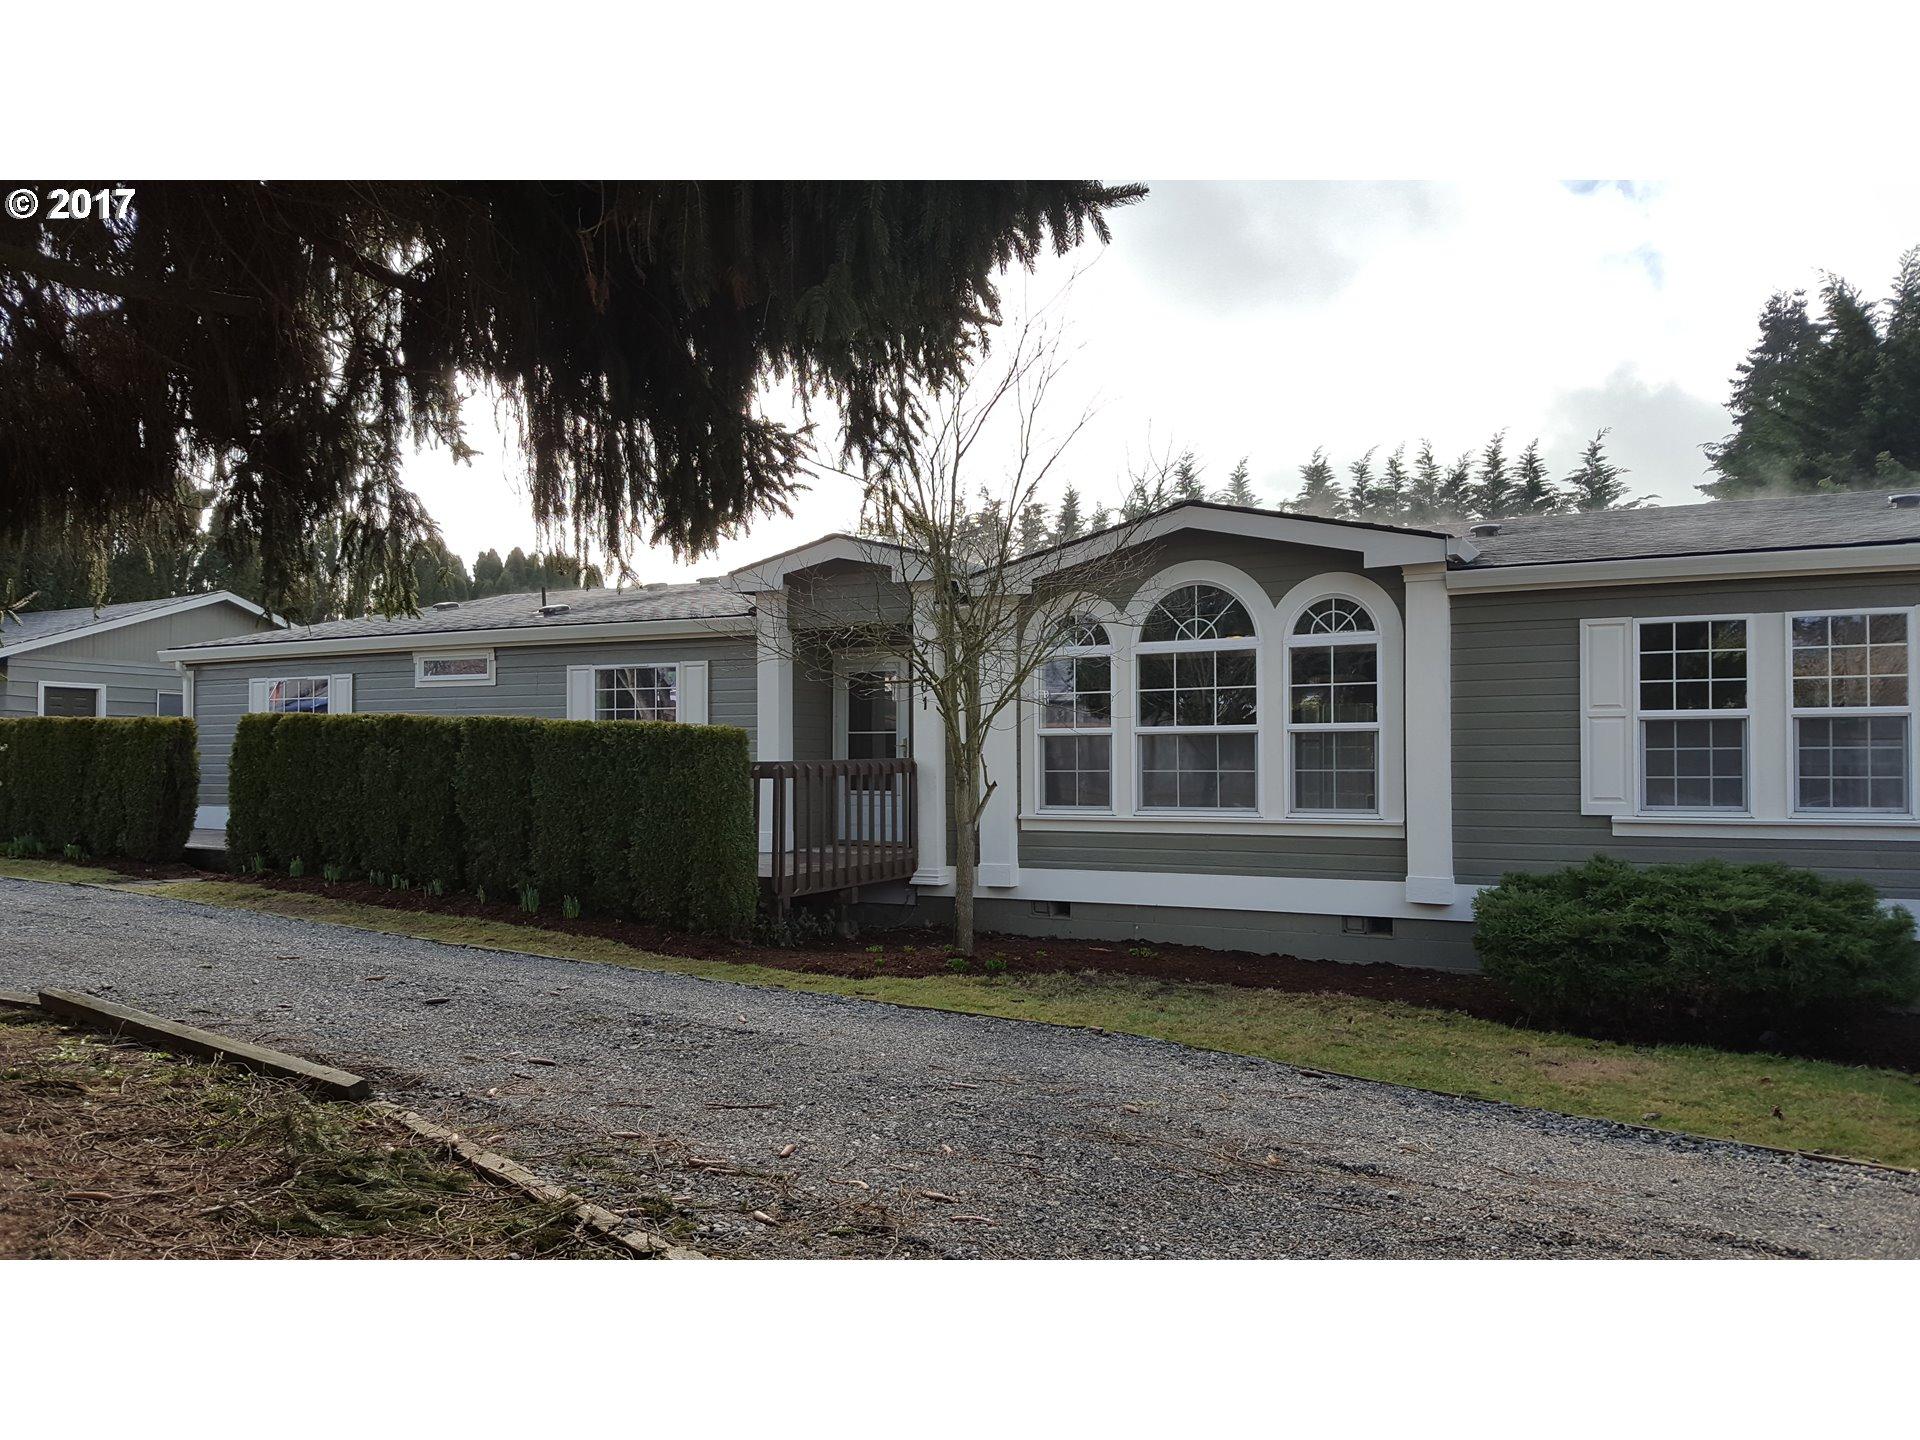 2201 NE 88TH ST, Vancouver, WA 98665